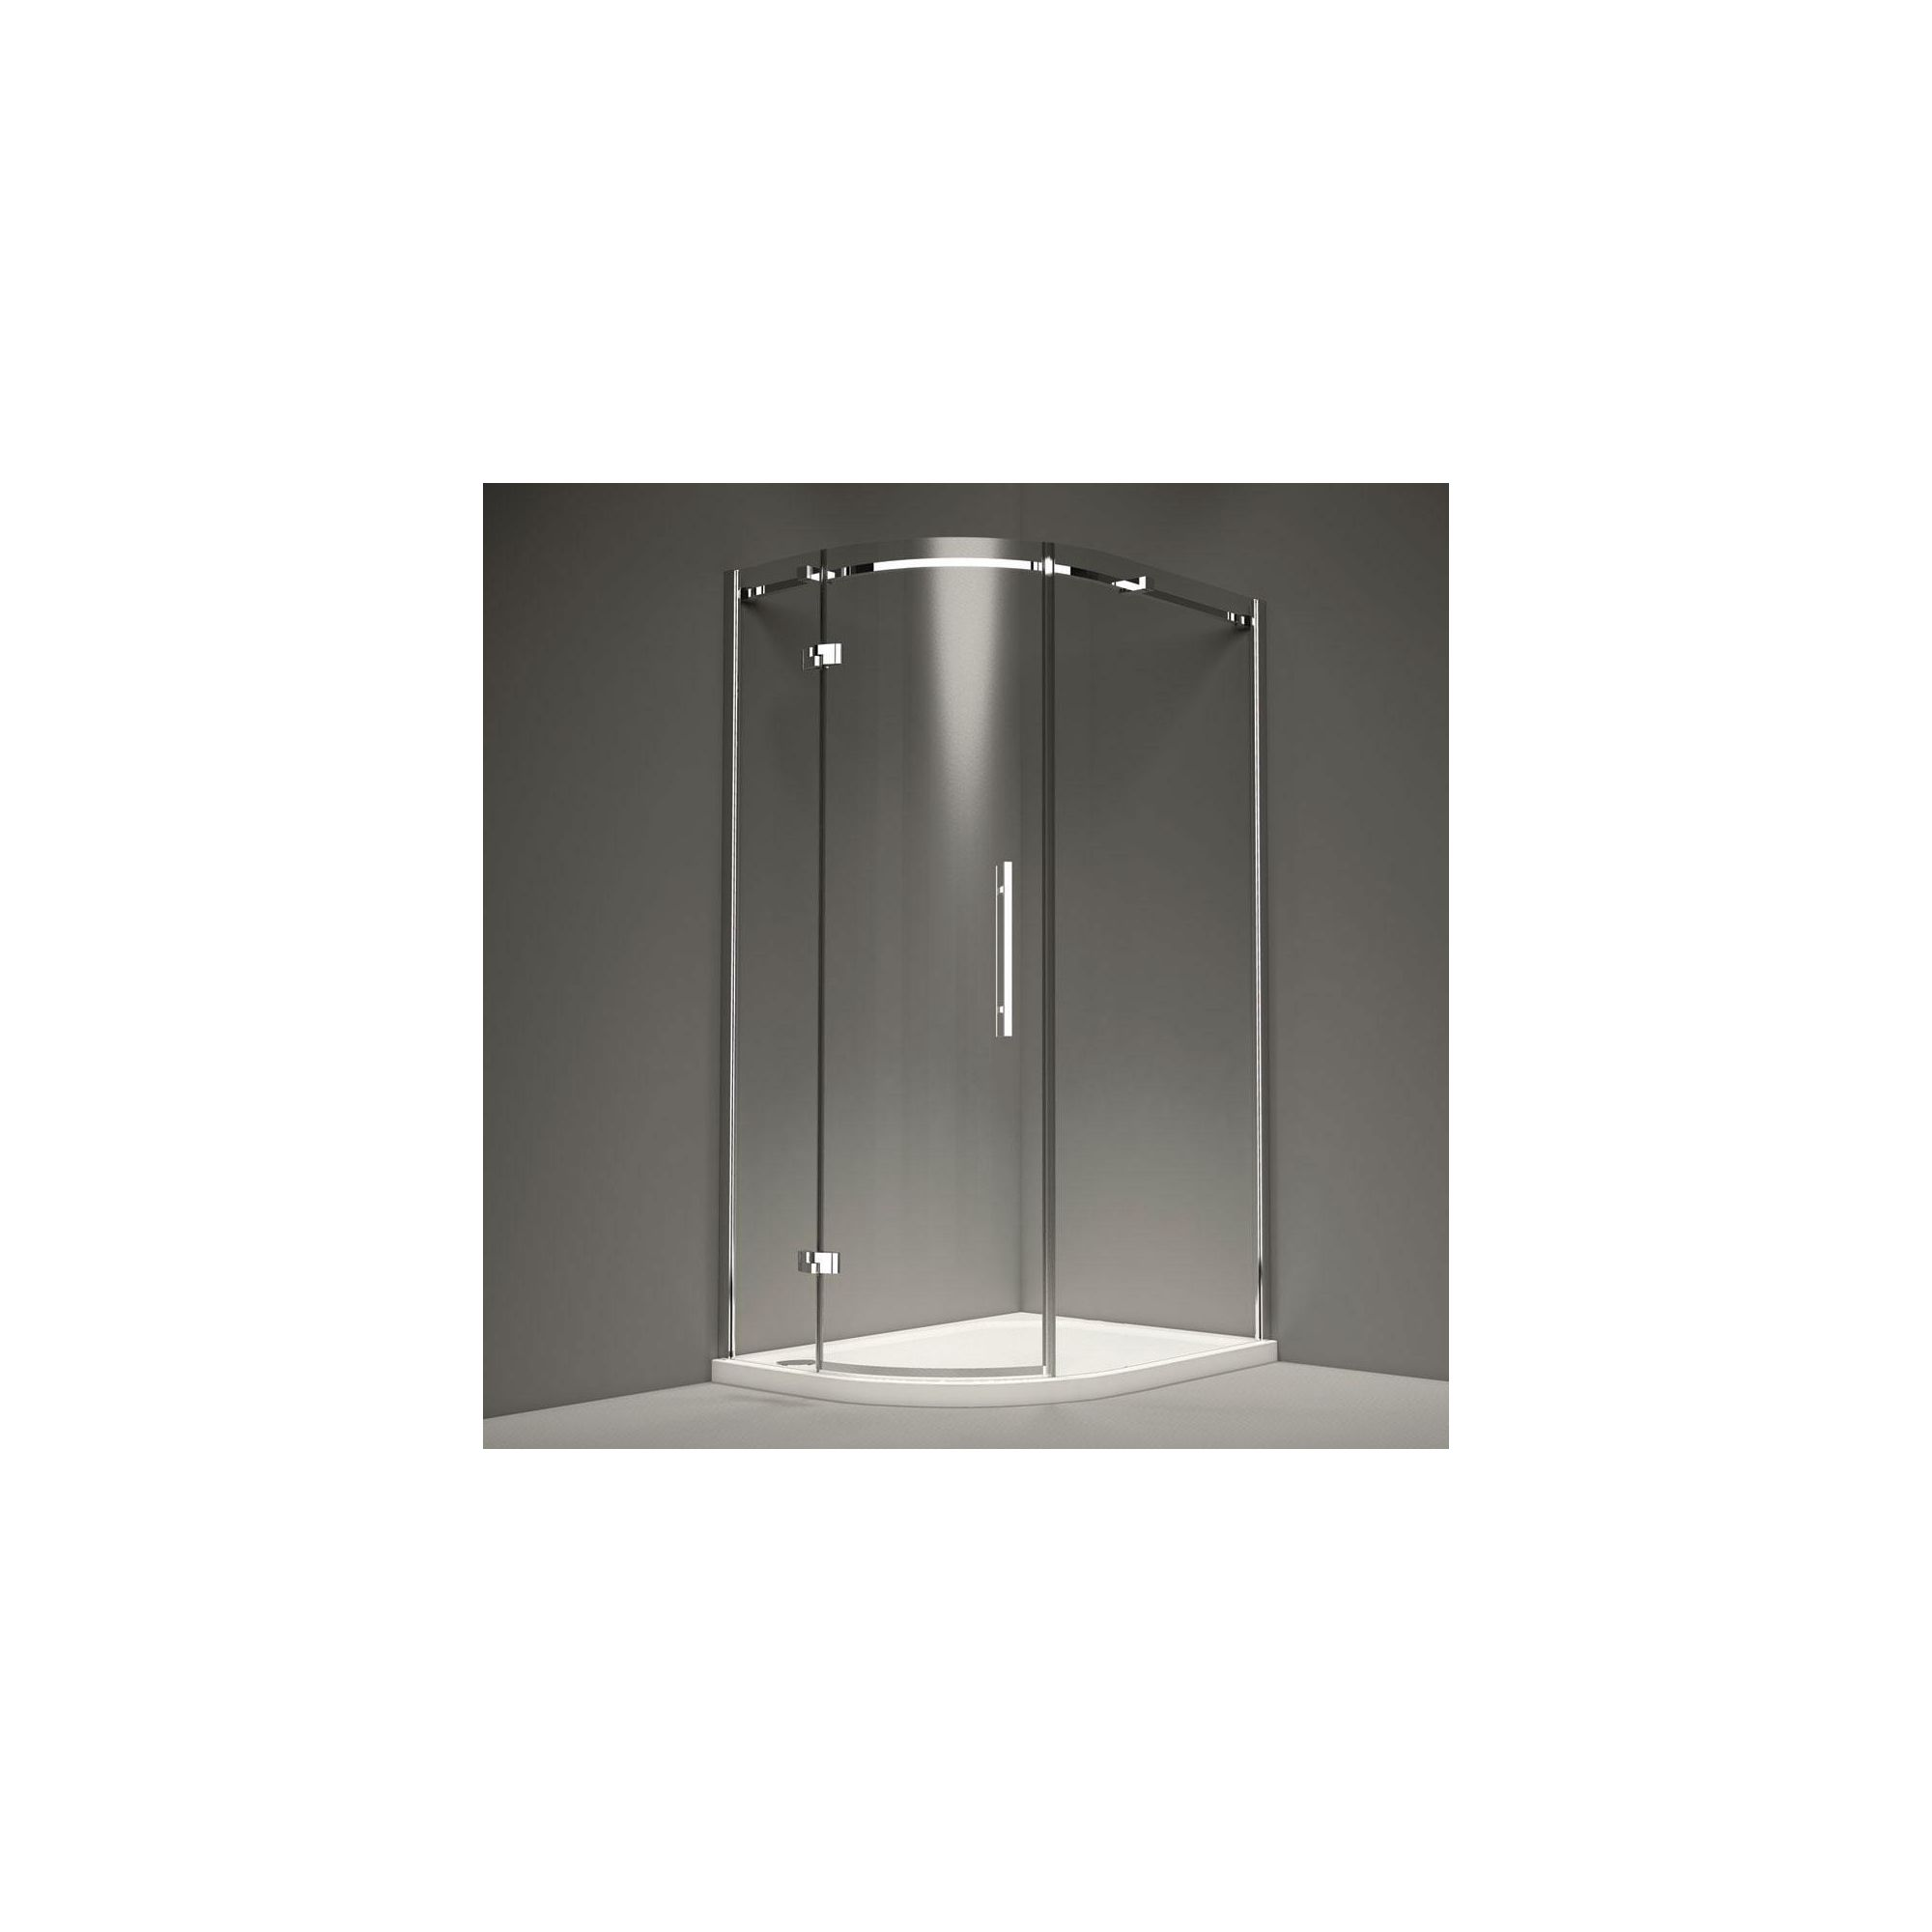 Merlyn Series 9 Single Quadrant Shower Door, 1000mm x 1000mm, 8mm Glass, Left Handed at Tesco Direct